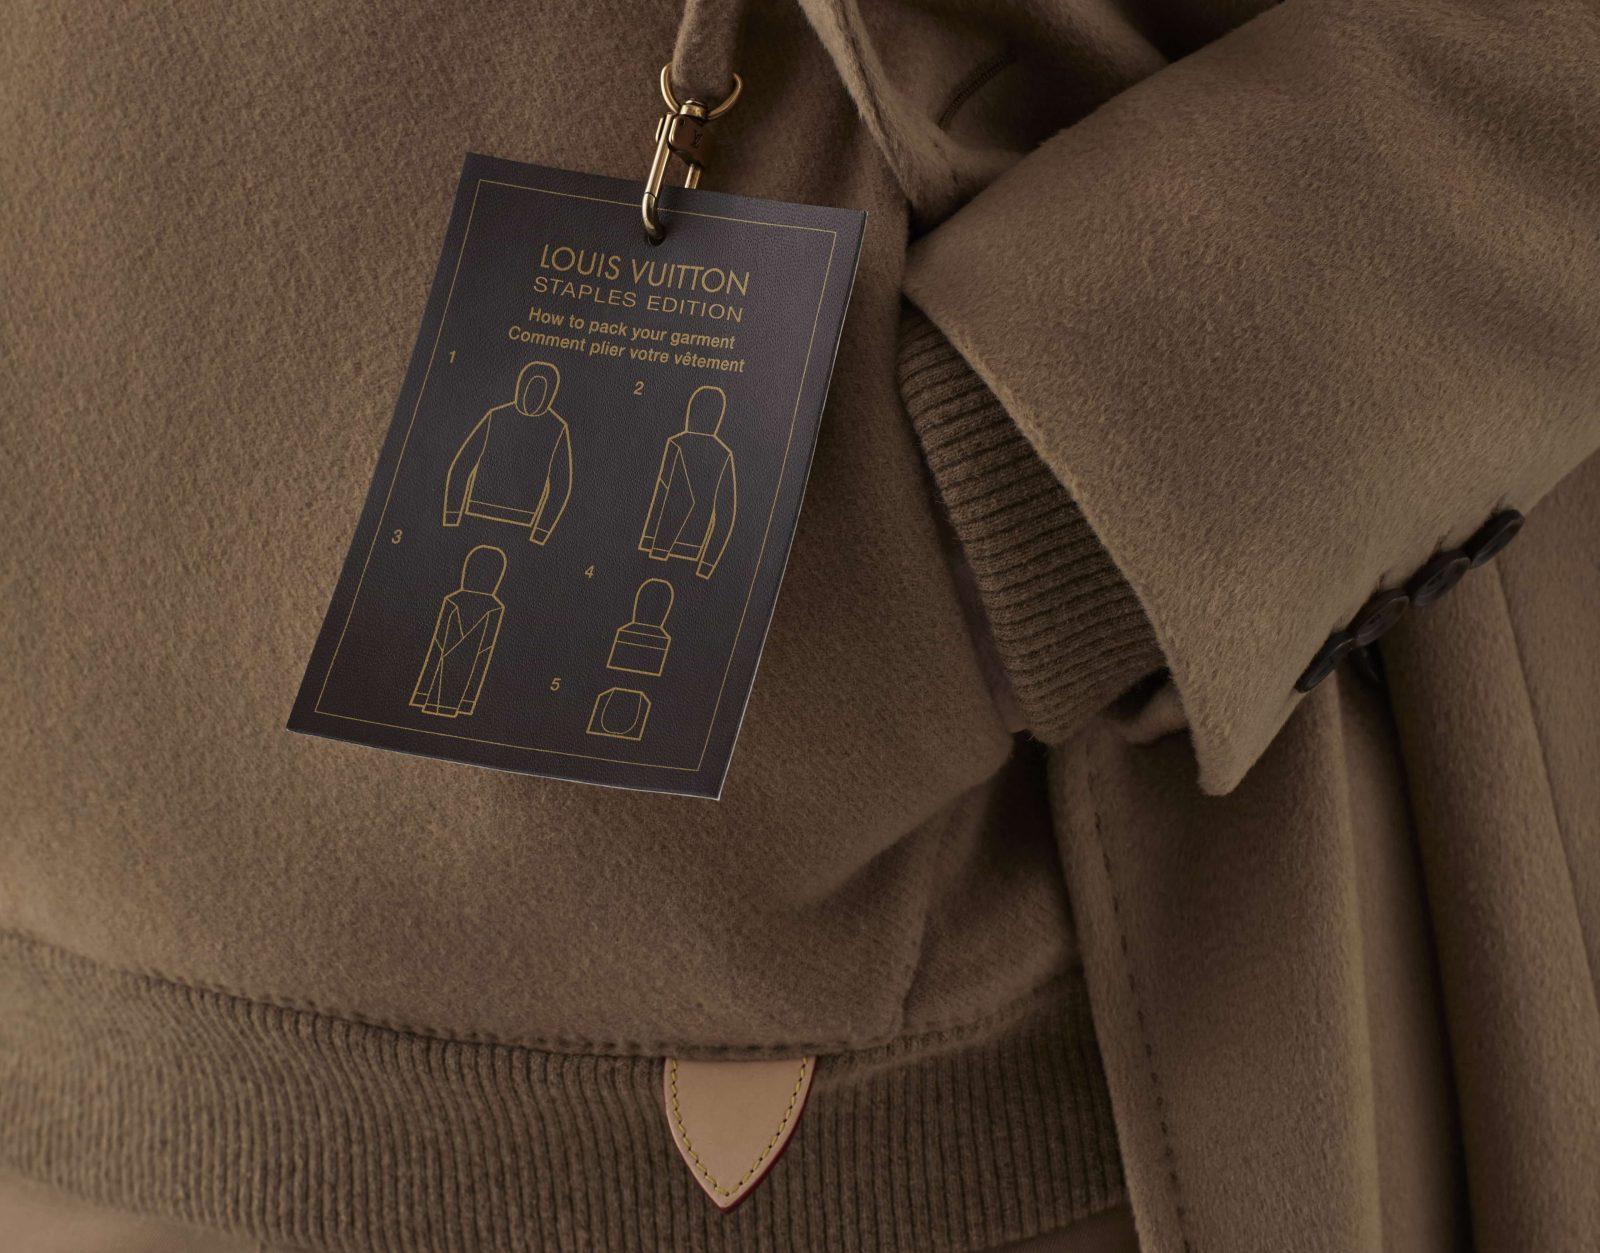 c9f9299a85ed Virgil Abloh Releases Staples Edition By Louis Vuitton